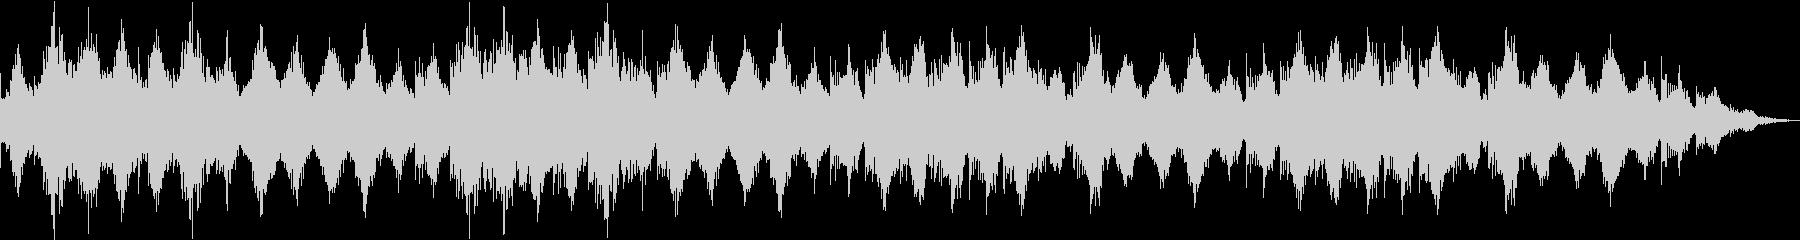 444Hzにチューニングされた癒やしの音の未再生の波形